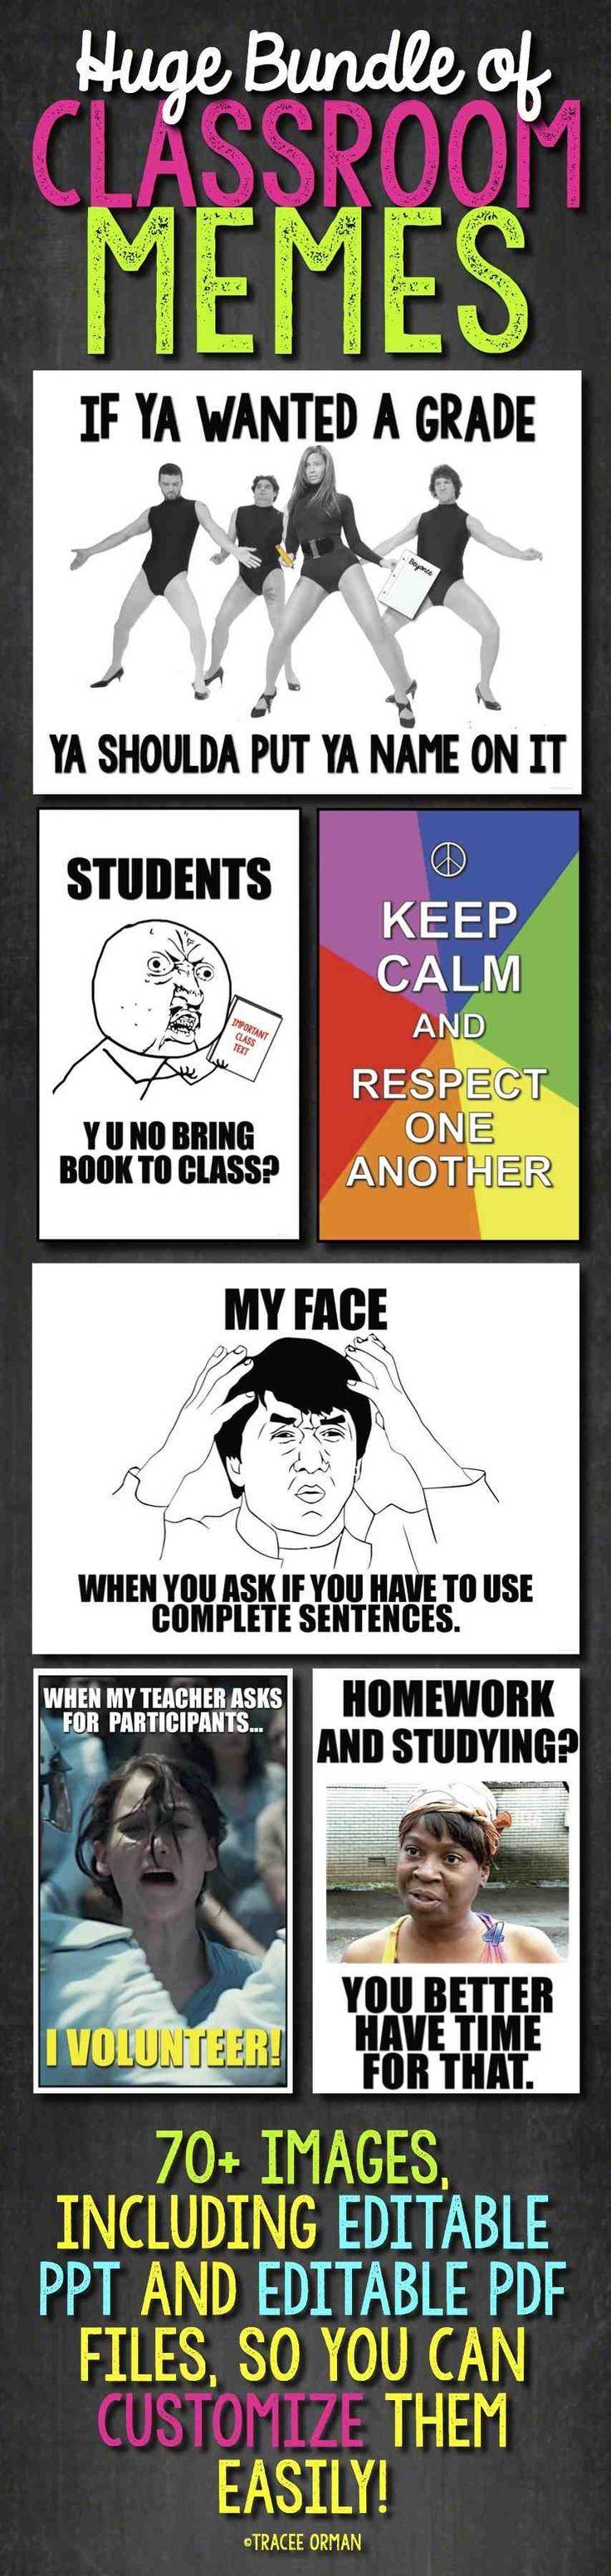 Teacher Memes Posters Editable Back To School Class Rules Classroom Memes School Classroom Teacher Humor